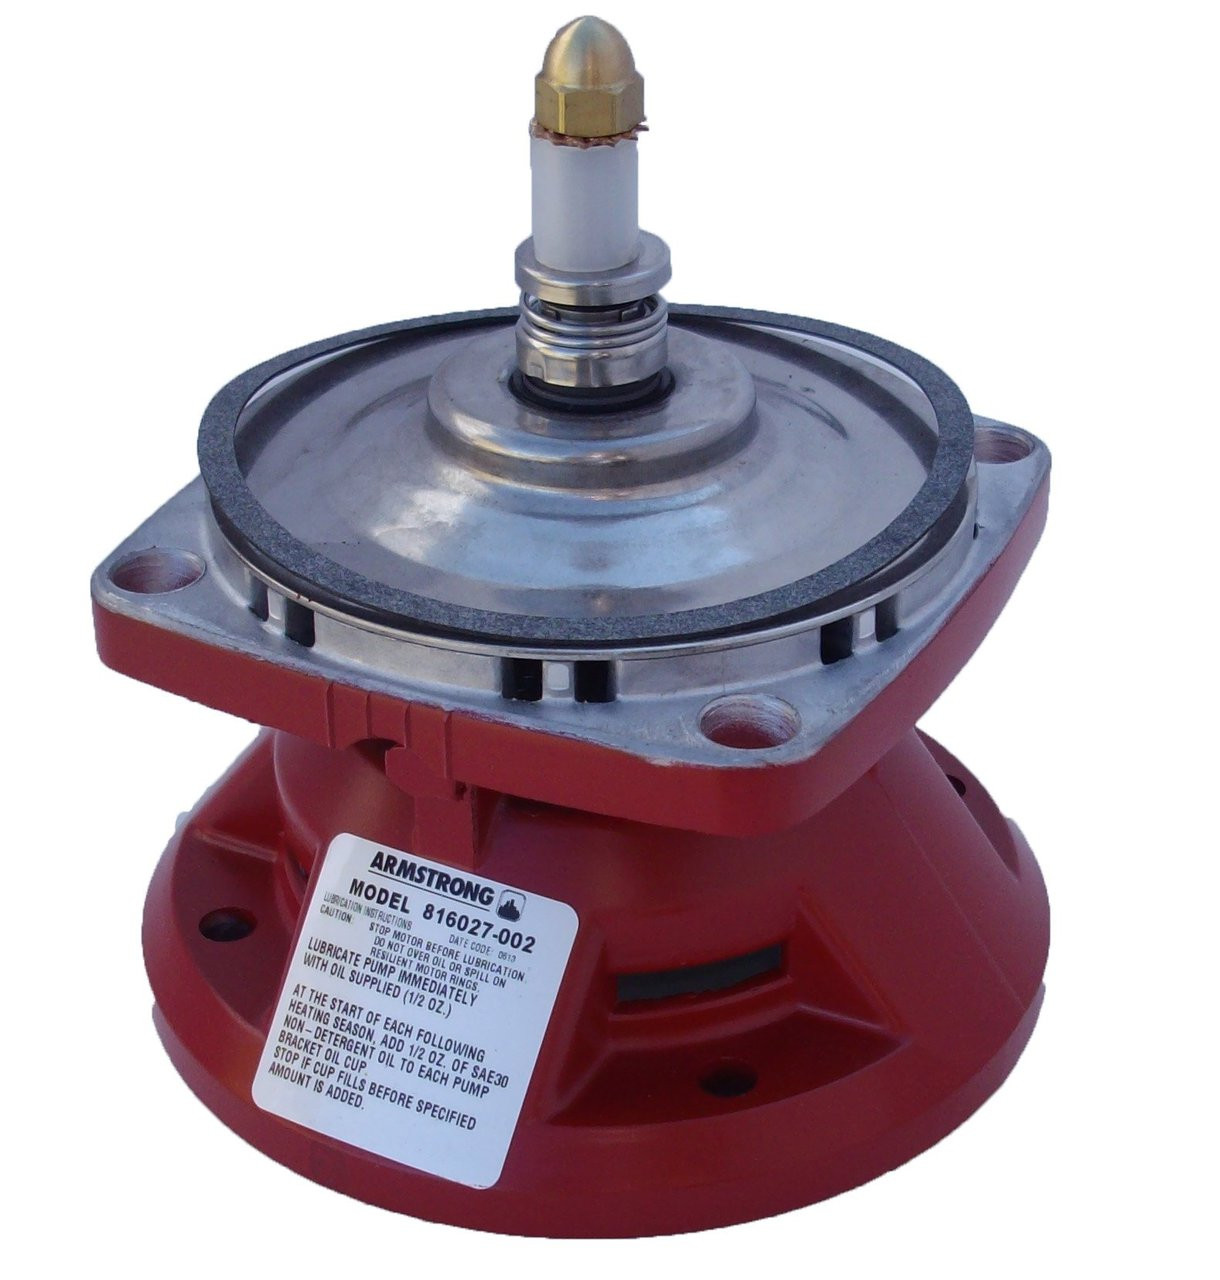 armstrong circulation pump bearing assemblies electric motor armstrong seal bearing assembly 816027 002 fits pump models s 45 s